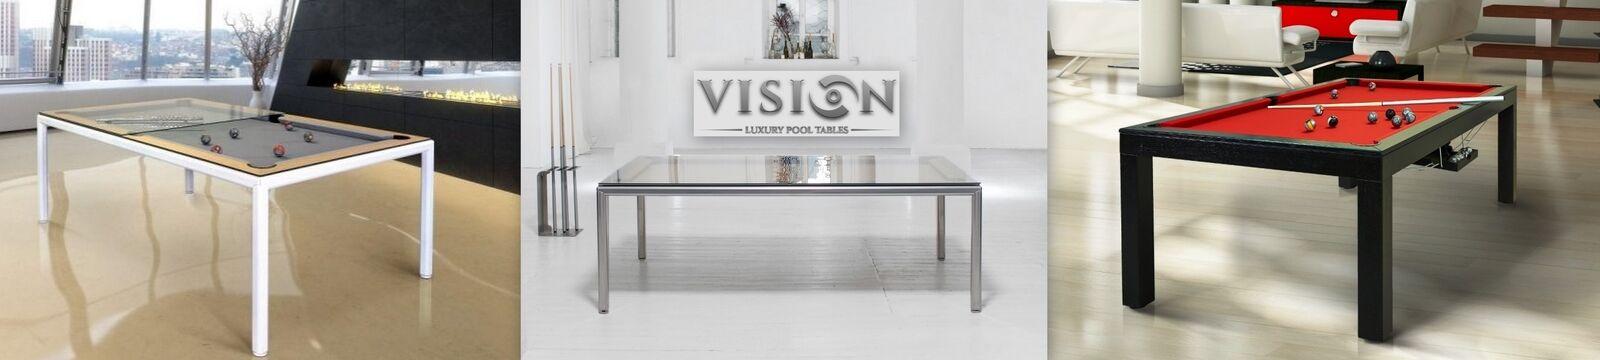 Vision Billiards